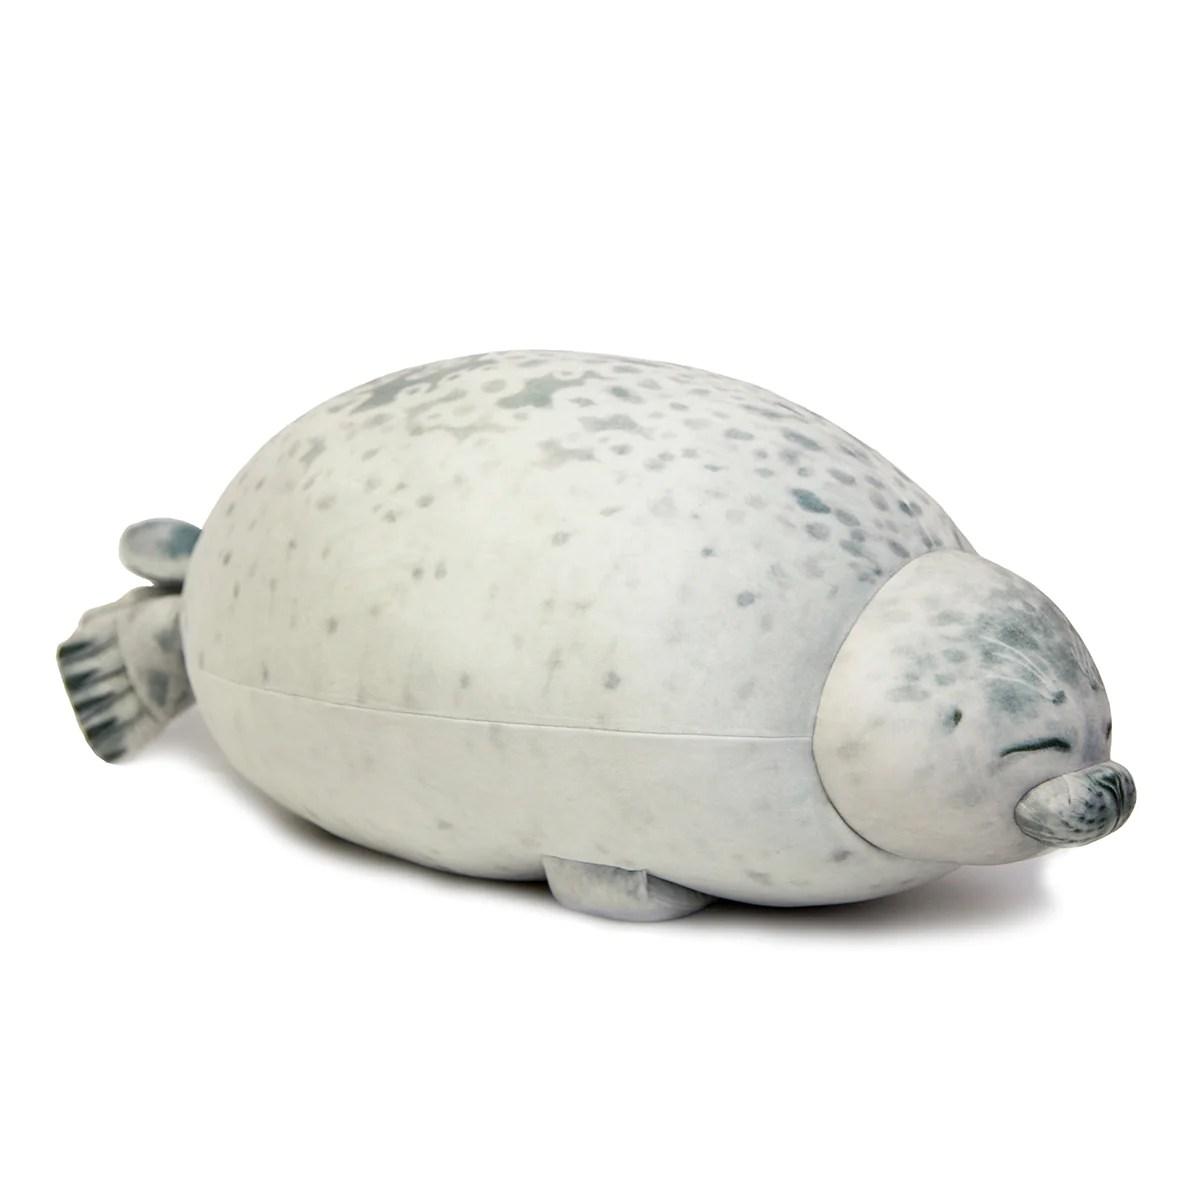 chubby angry seal pillow plush stuffed